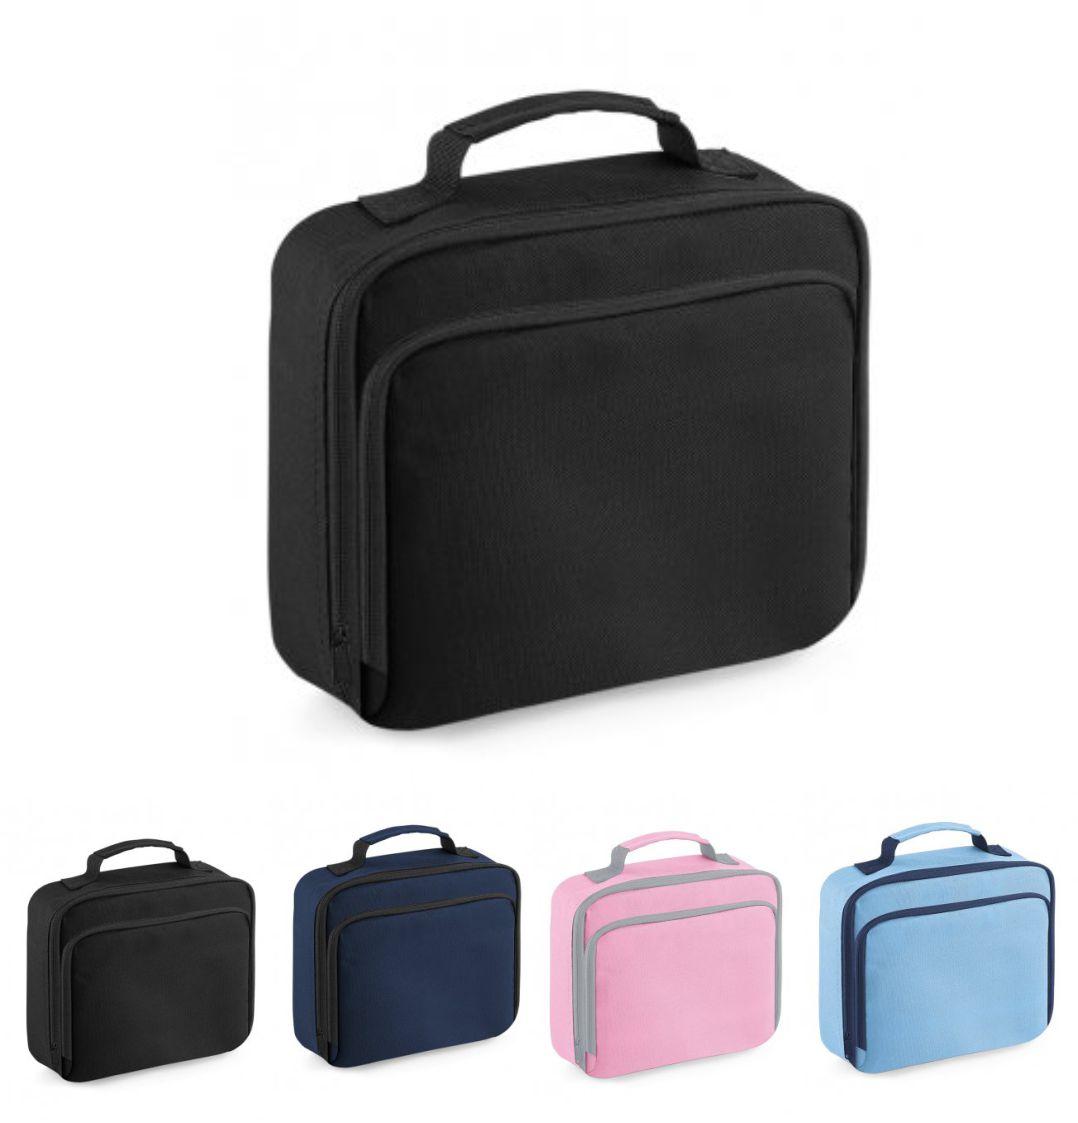 948a0e2c50d8 QD435 Quadra Lunch Cooler Bag - £4.85 : Ark Trading, Corporate ...